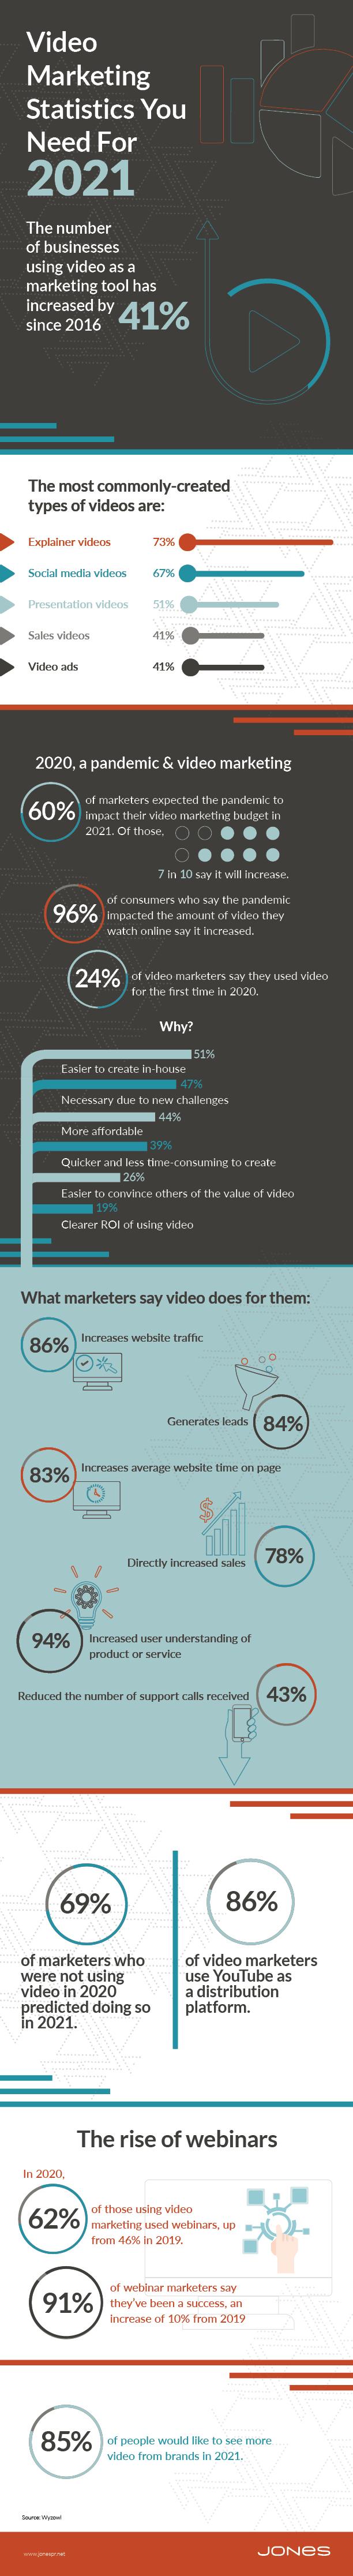 jones-infographic-2021-video-marketing-stat